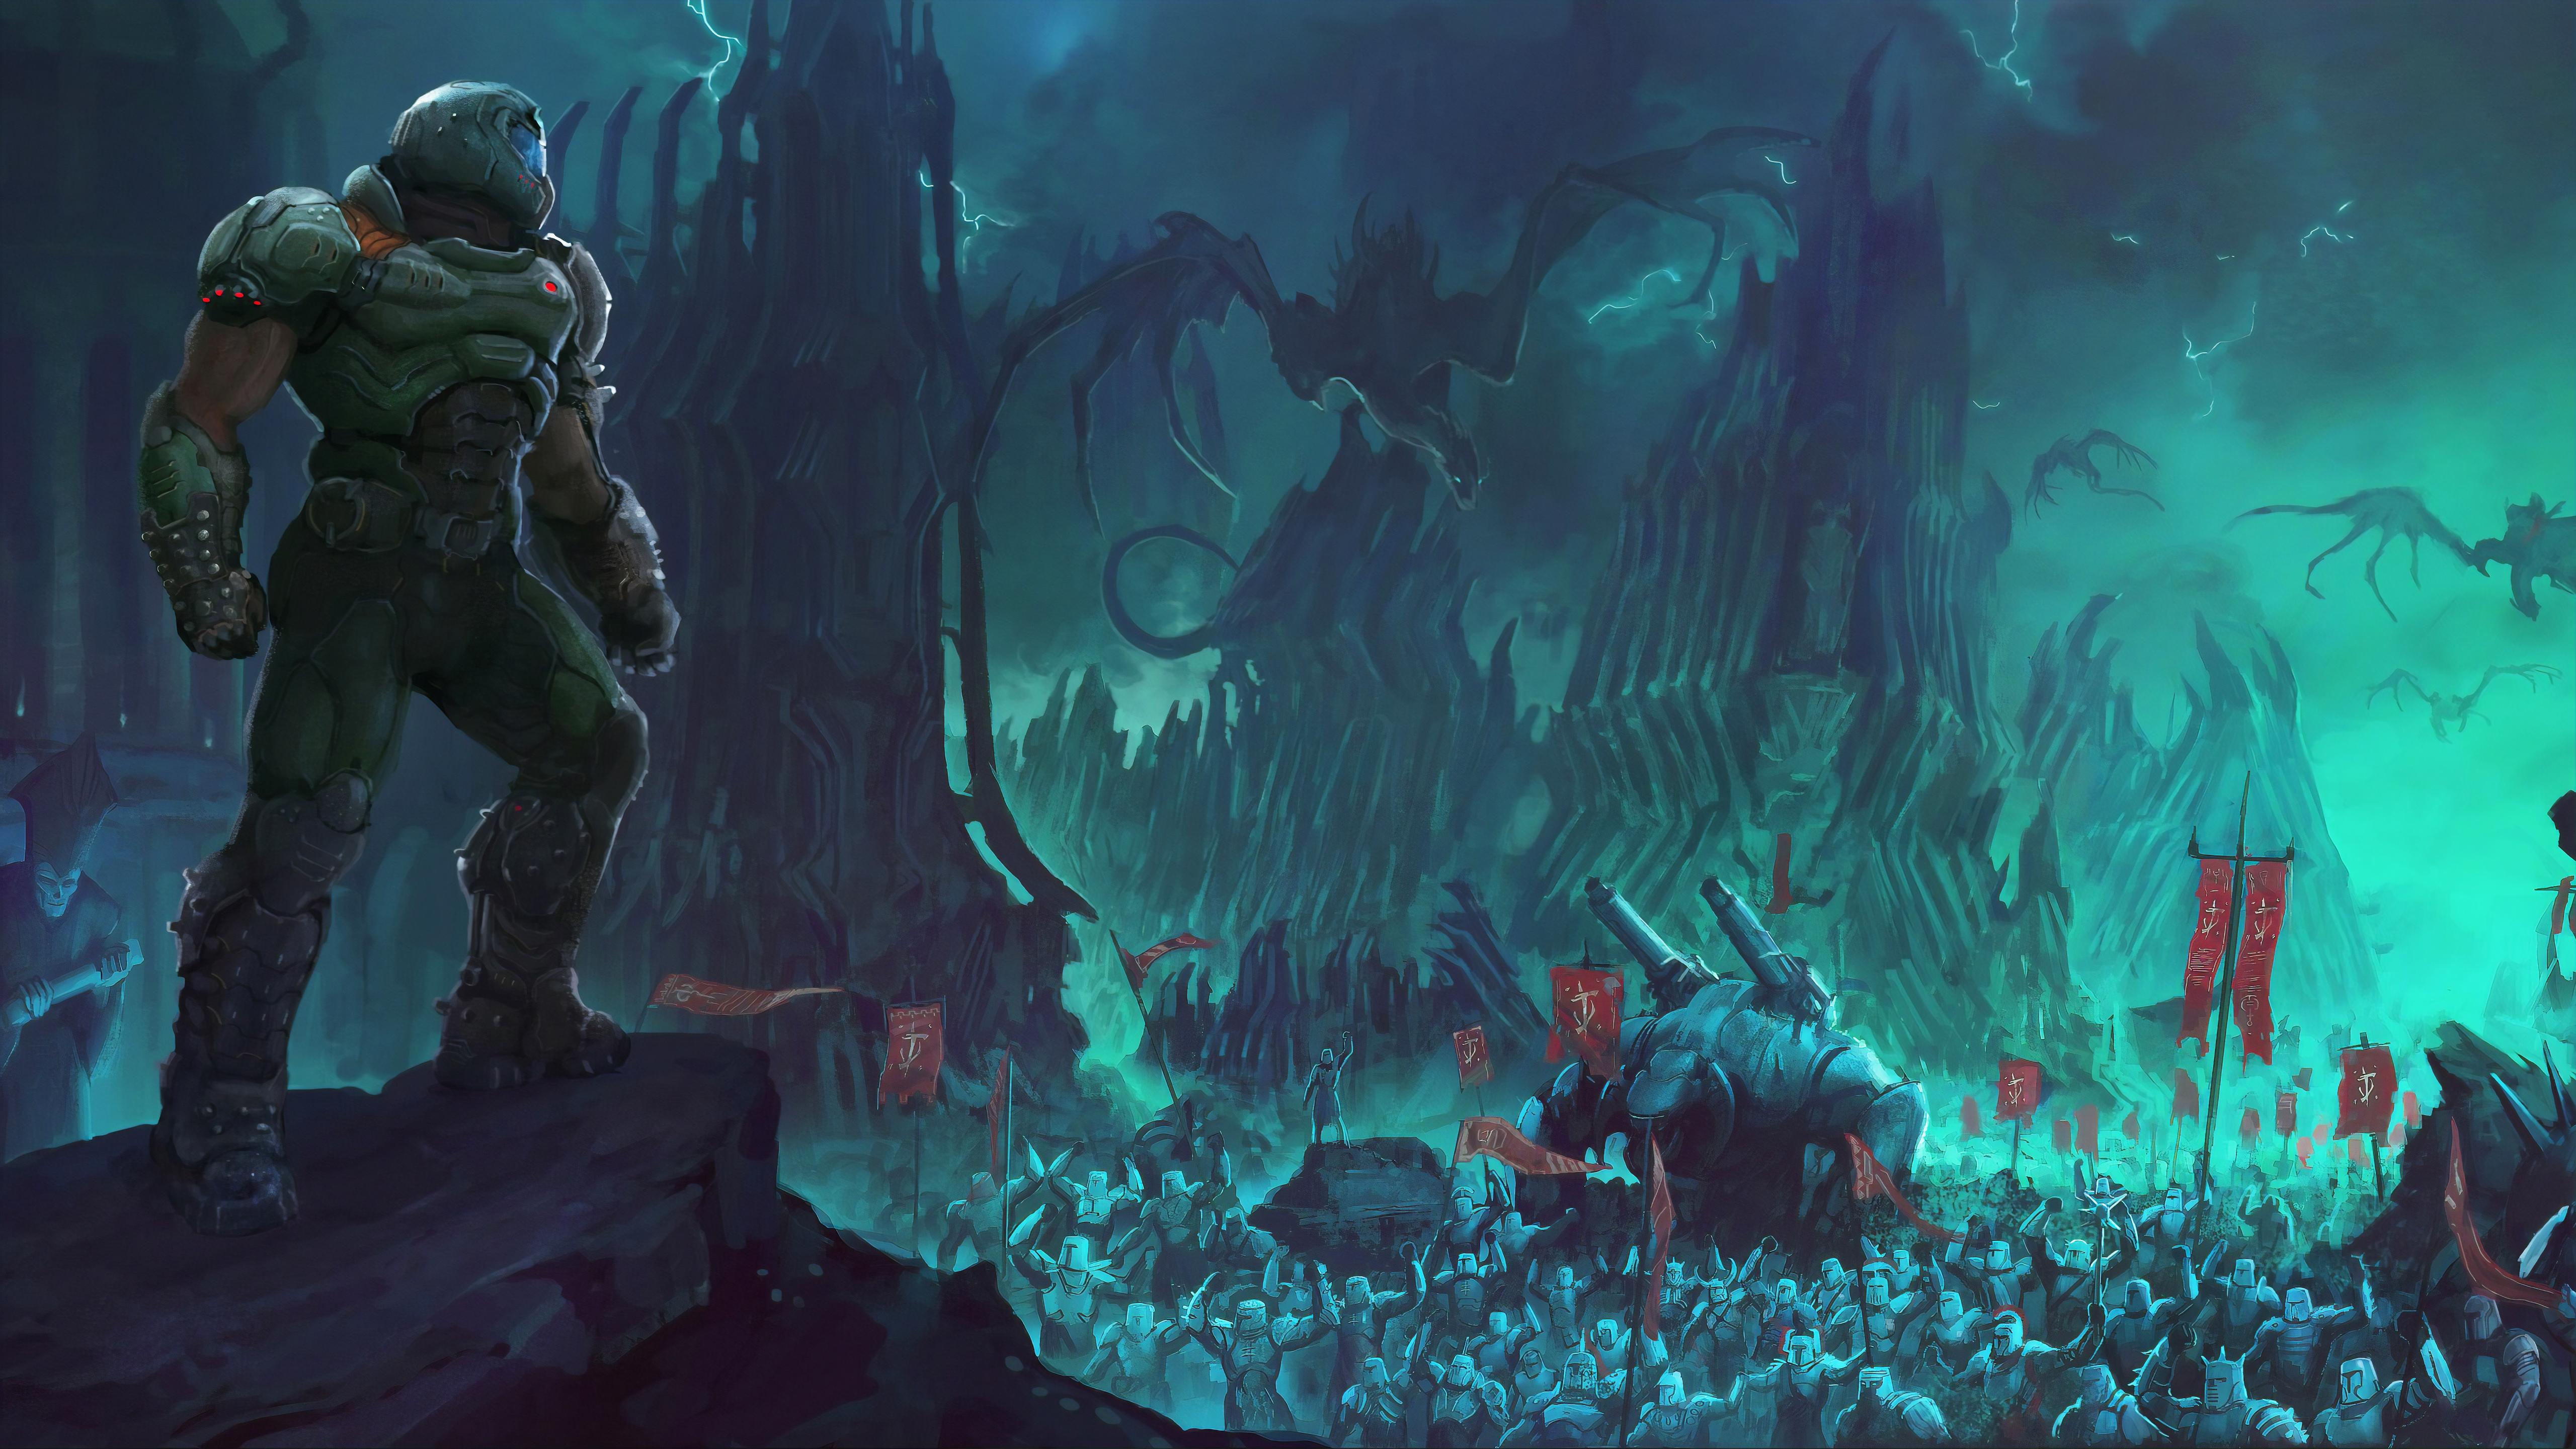 2019 Doom Eternal 4k Hd Games 4k Wallpapers Images Backgrounds